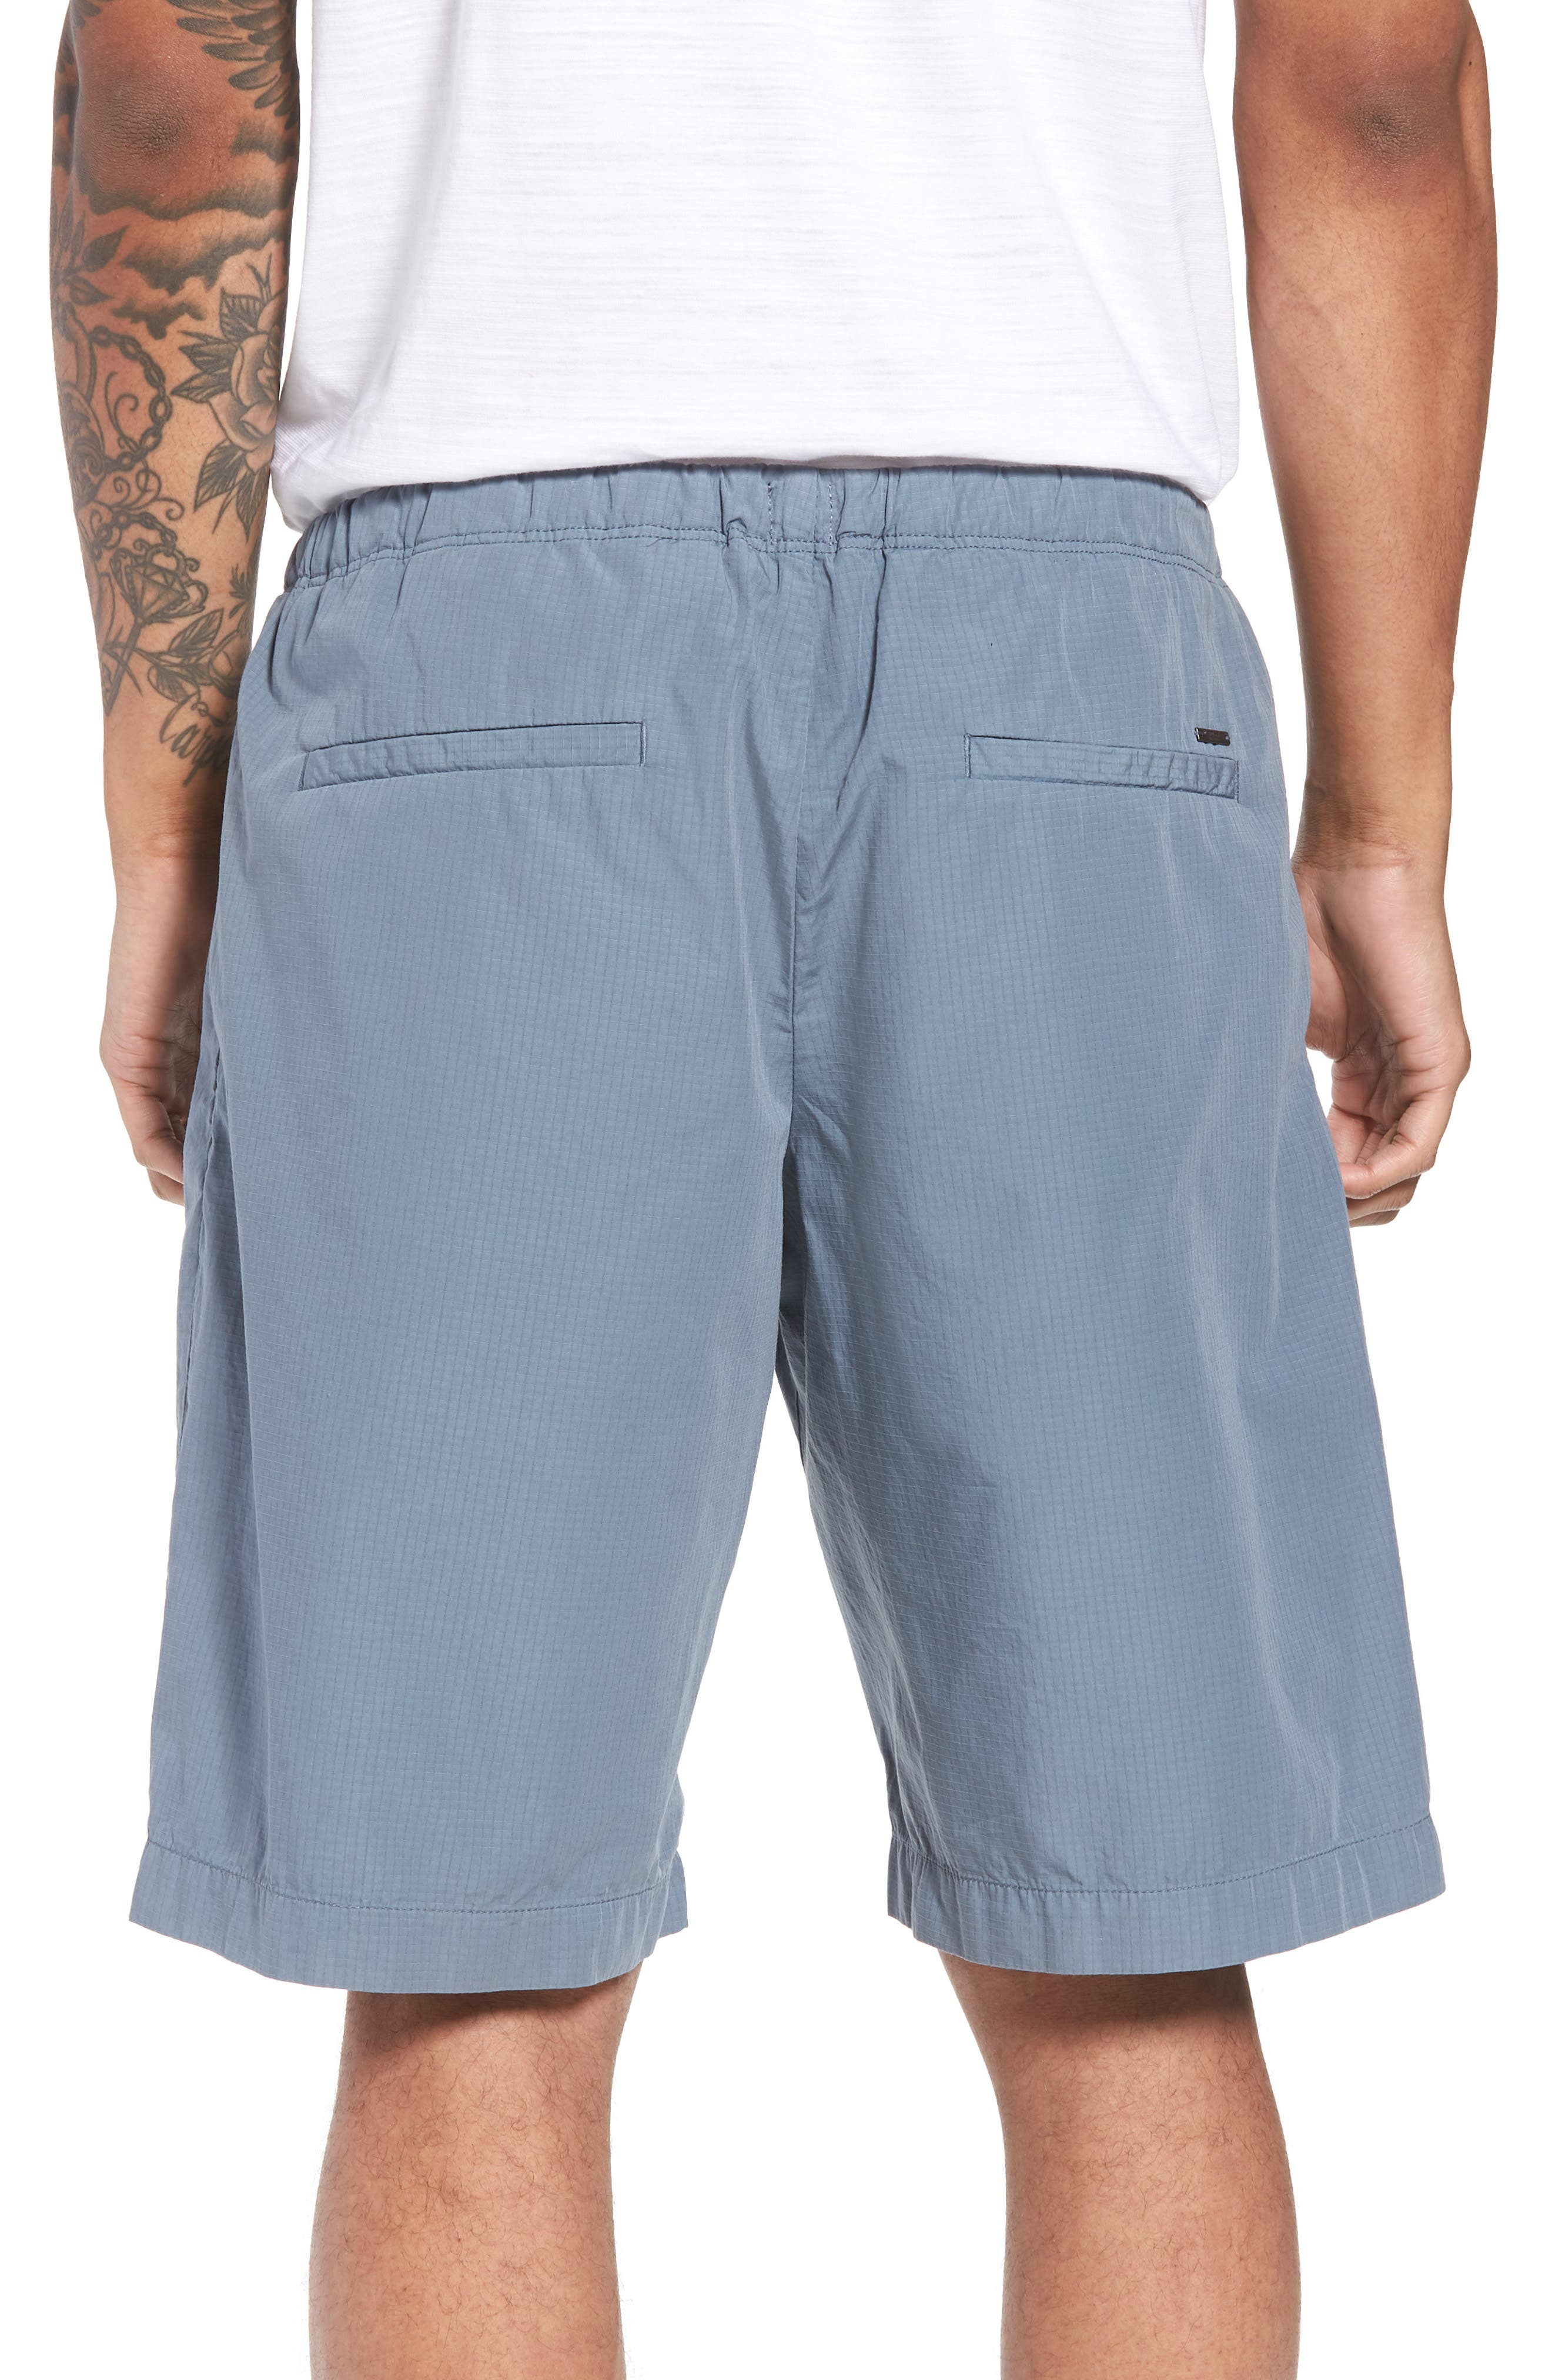 Passeo Cotton Shorts,                             Alternate thumbnail 2, color,                             GREY